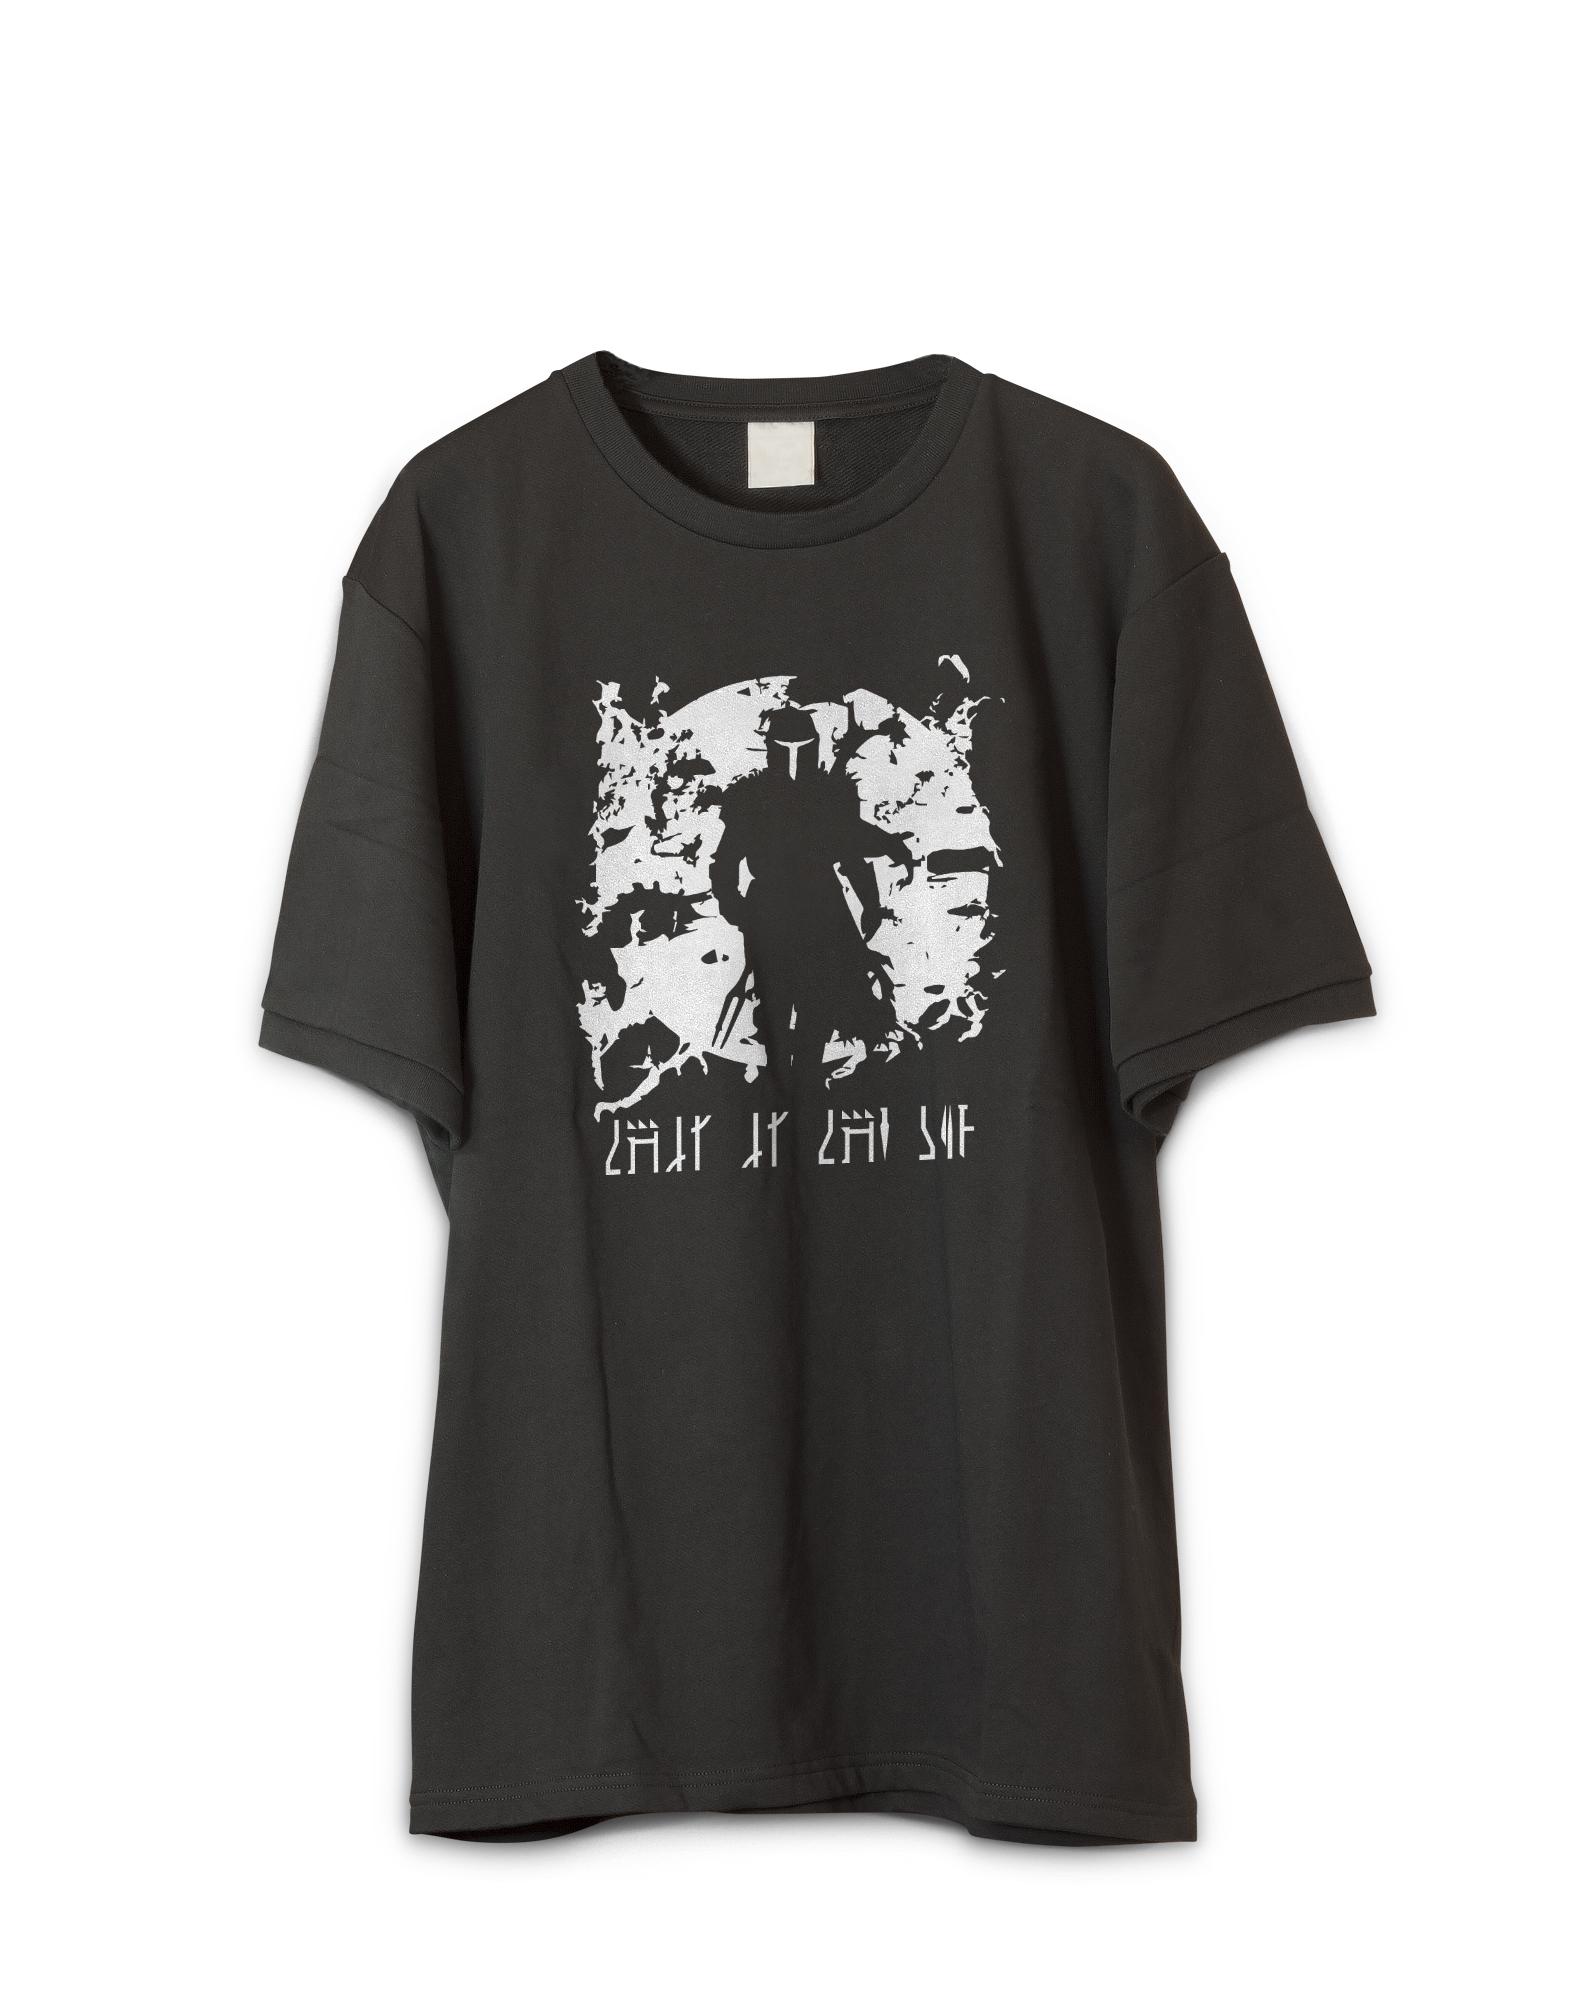 Mando This is The Way Bounty Hunter T-Shirt